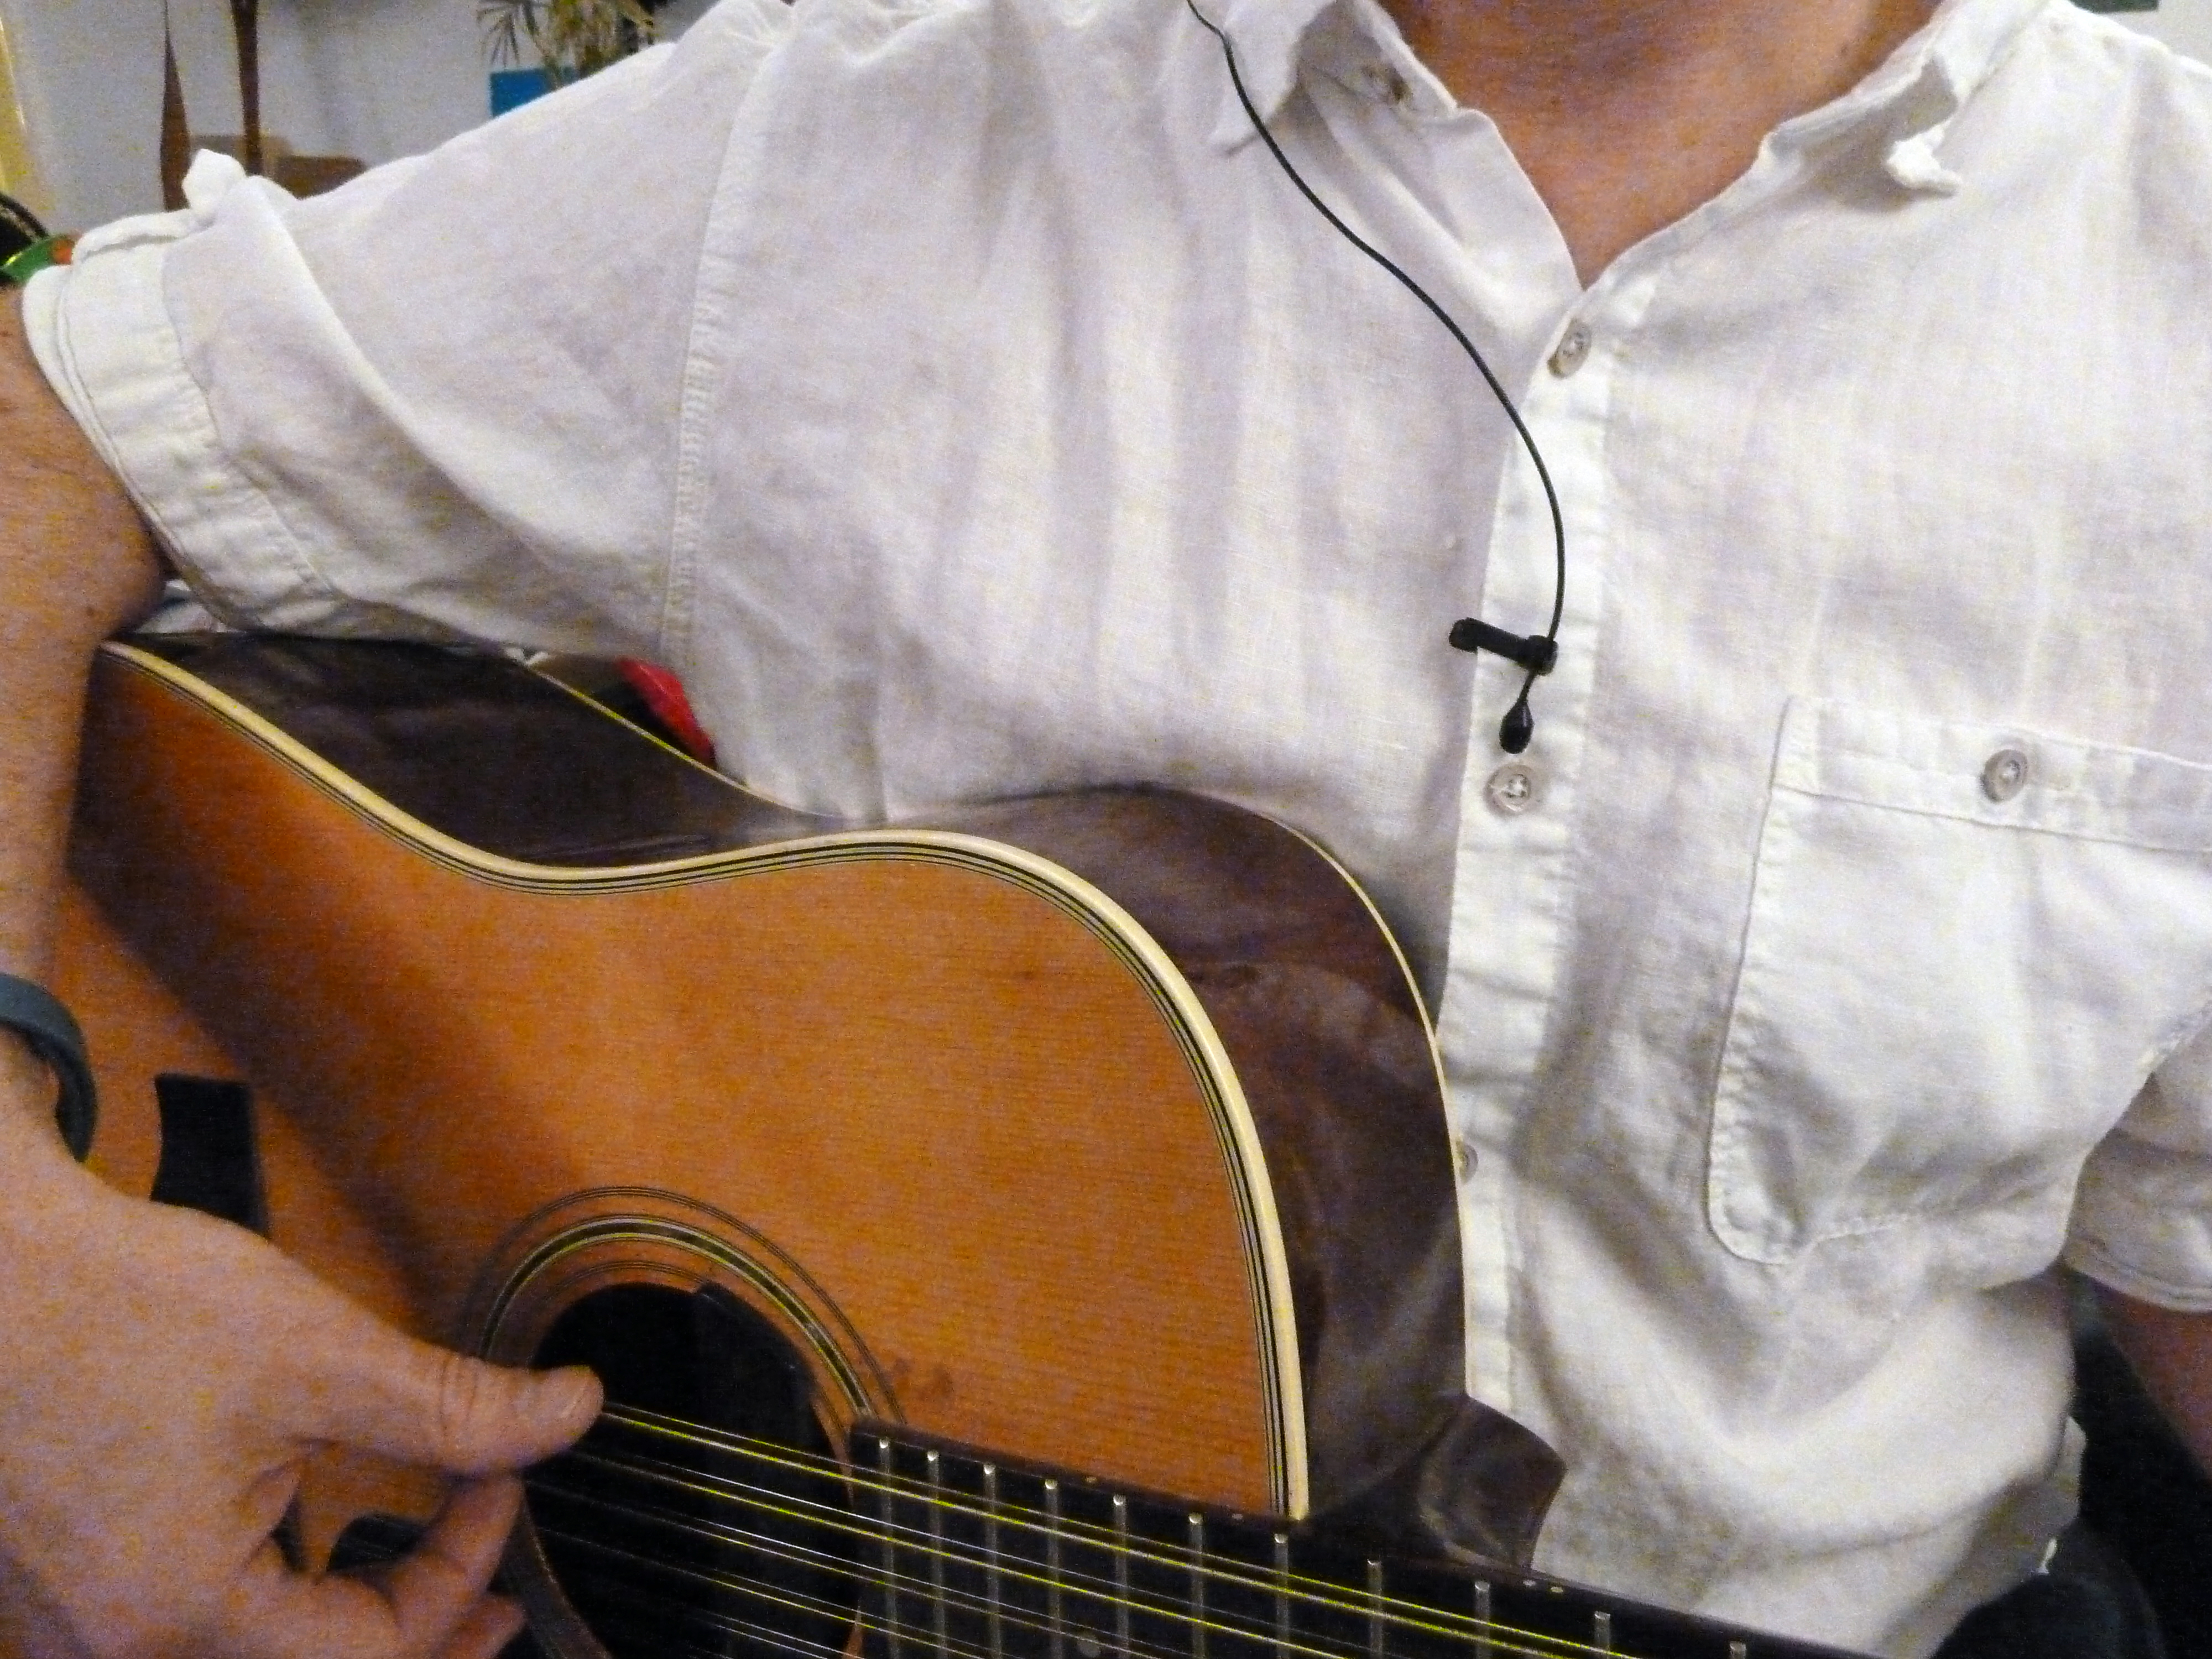 Lavalier Micing Acoustic Guitar